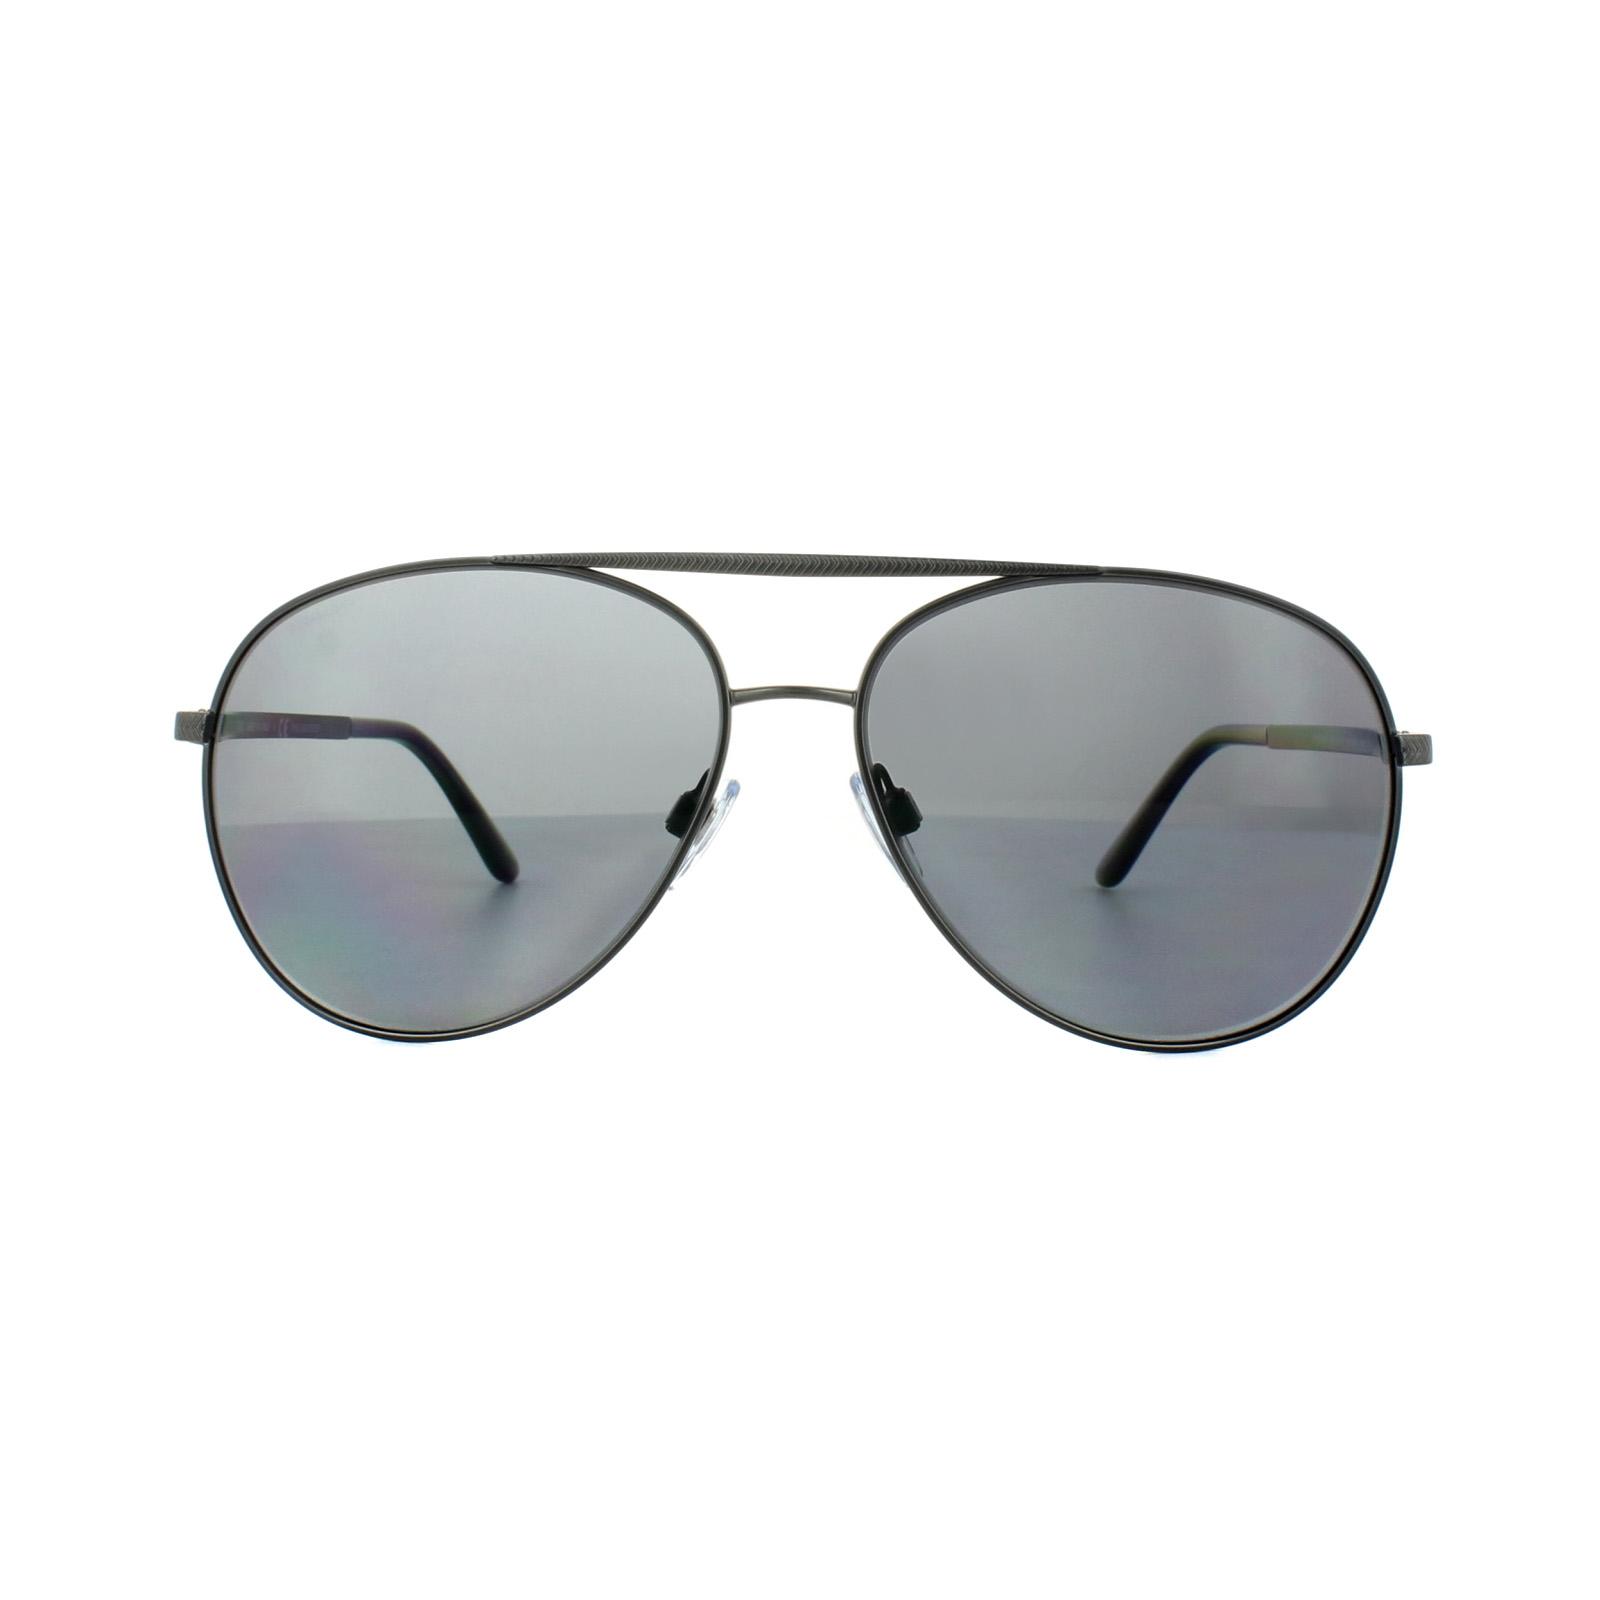 e31561d1ff47 Sentinel Thumbnail 2. Sentinel Giorgio Armani Sunglasses AR6030 312181 Matt  Grey Grey Polarized